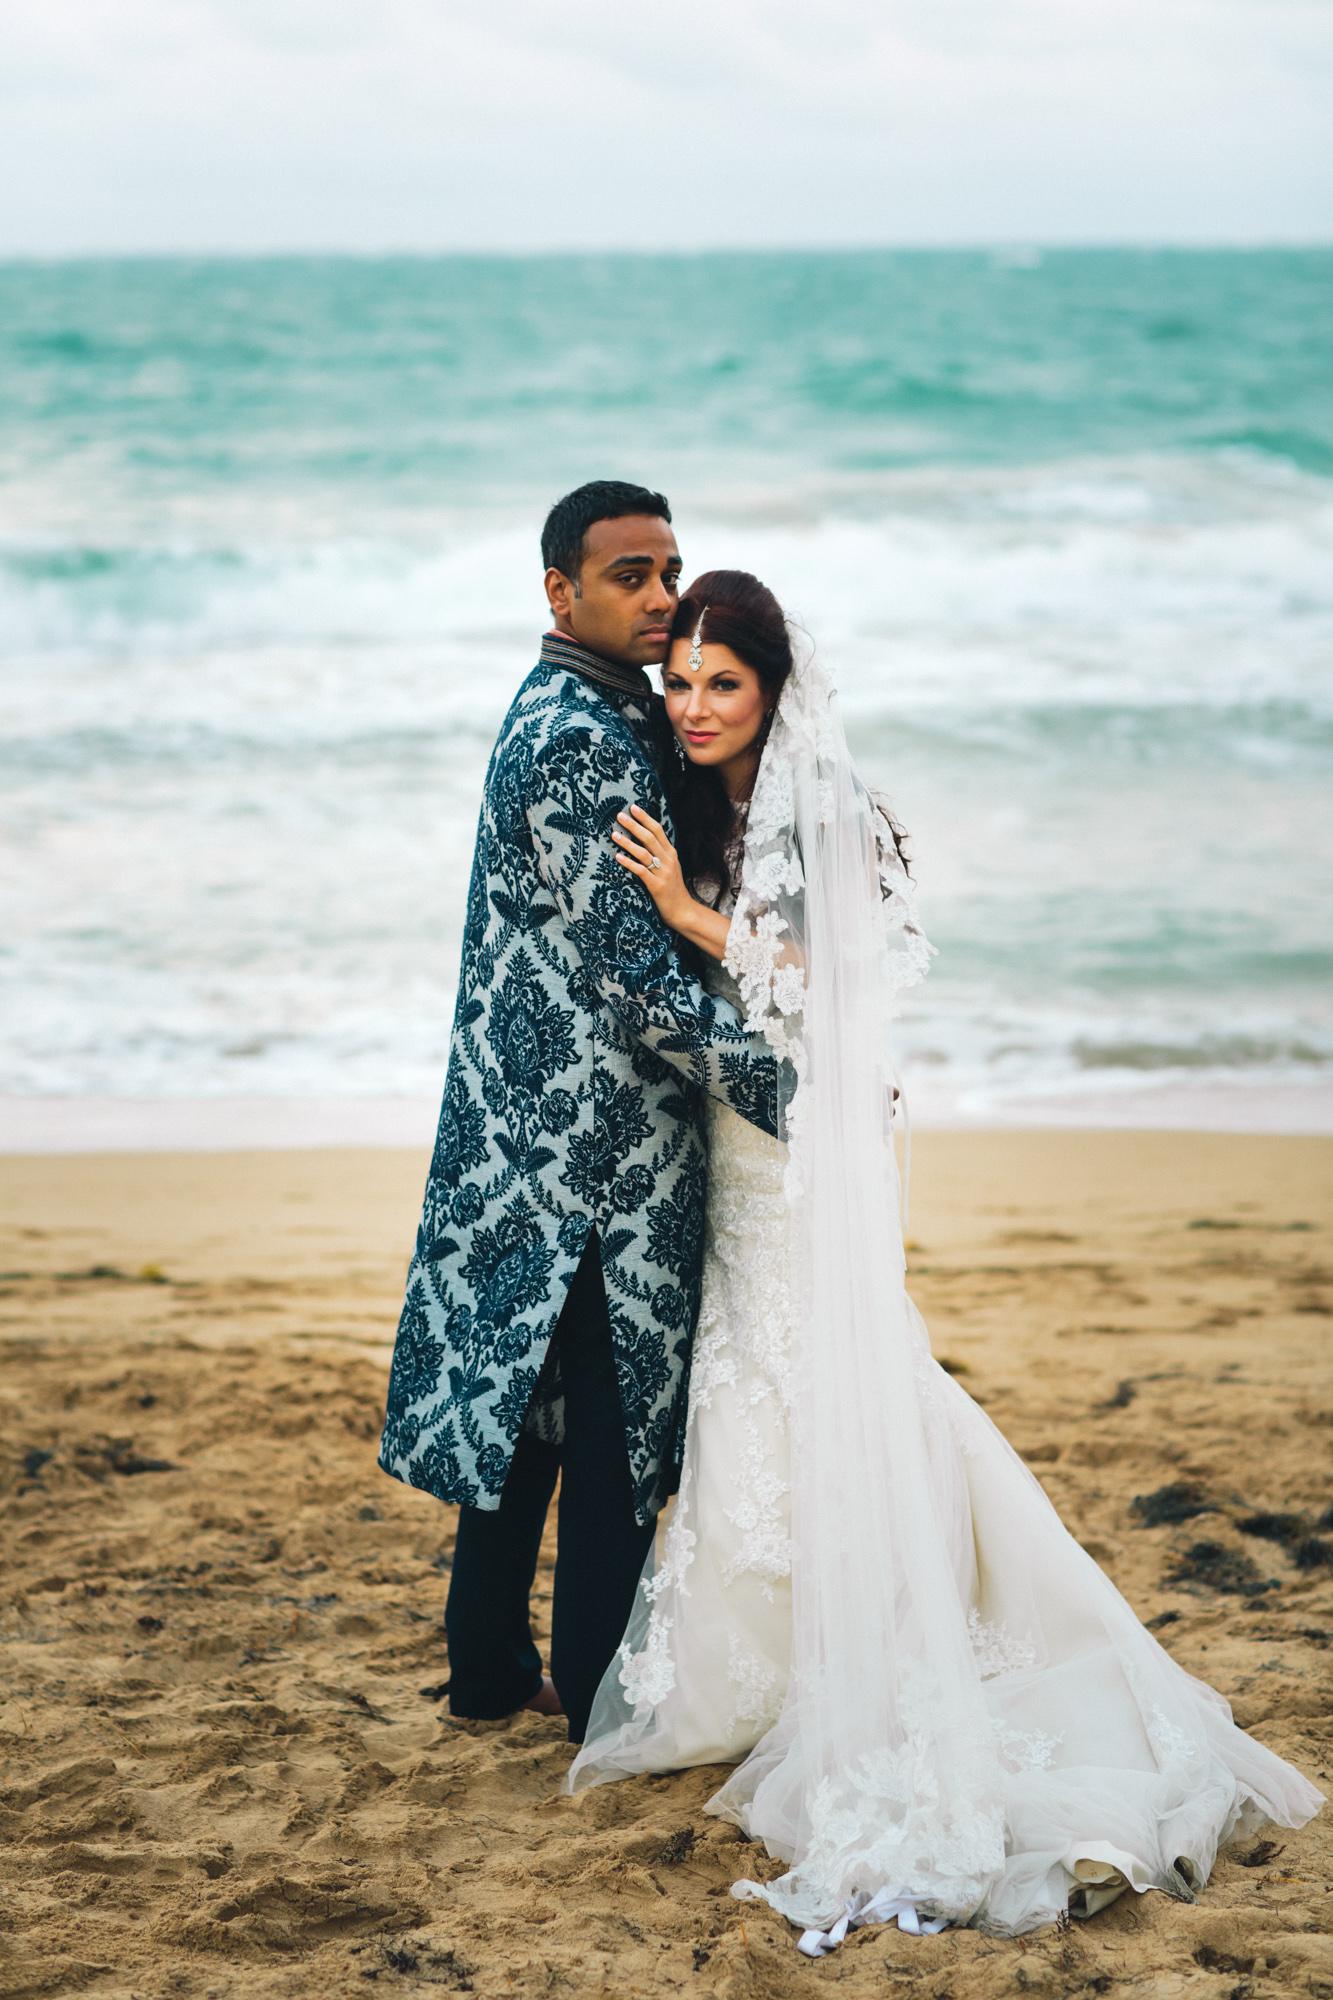 Puerto Rico Wedding Photography Destination Photographer Boris Zaretsky San Juan PR Casino Antiguo La Concha _B2C7364.jpg